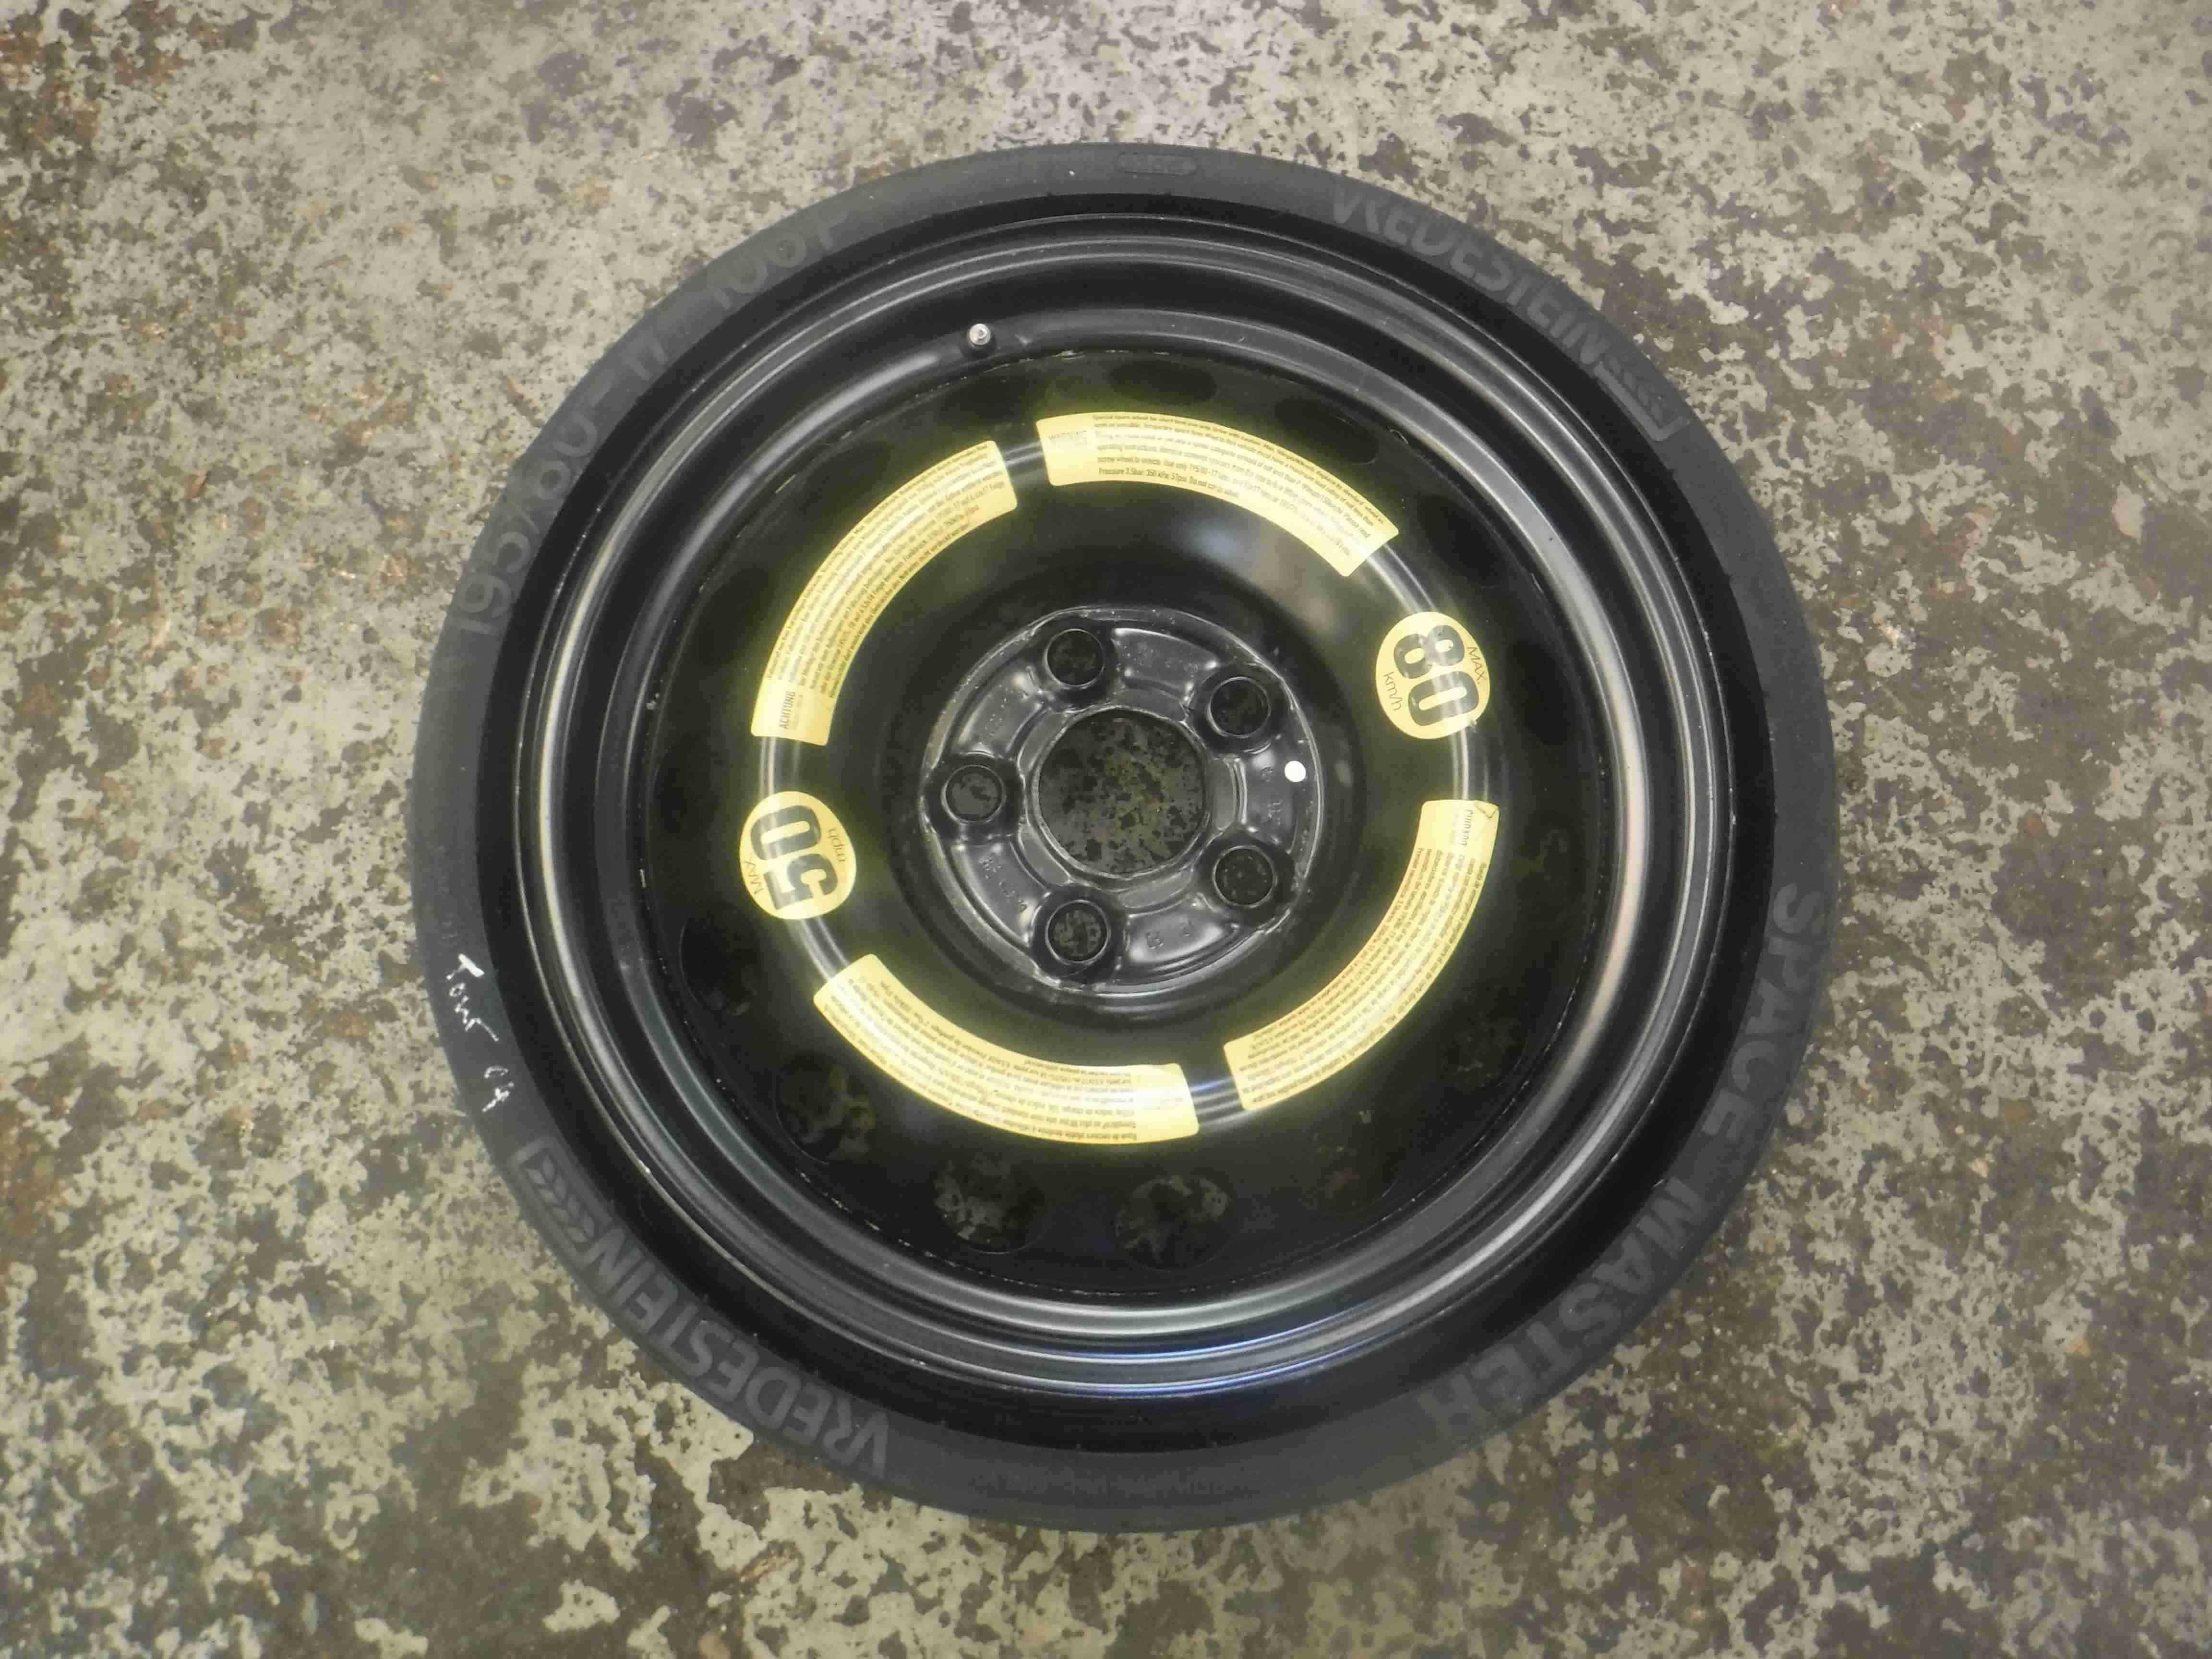 Volkswagen Touareg + Porche Cayenne 2002-2007 Spare Wheel Space Saver 195 80 17